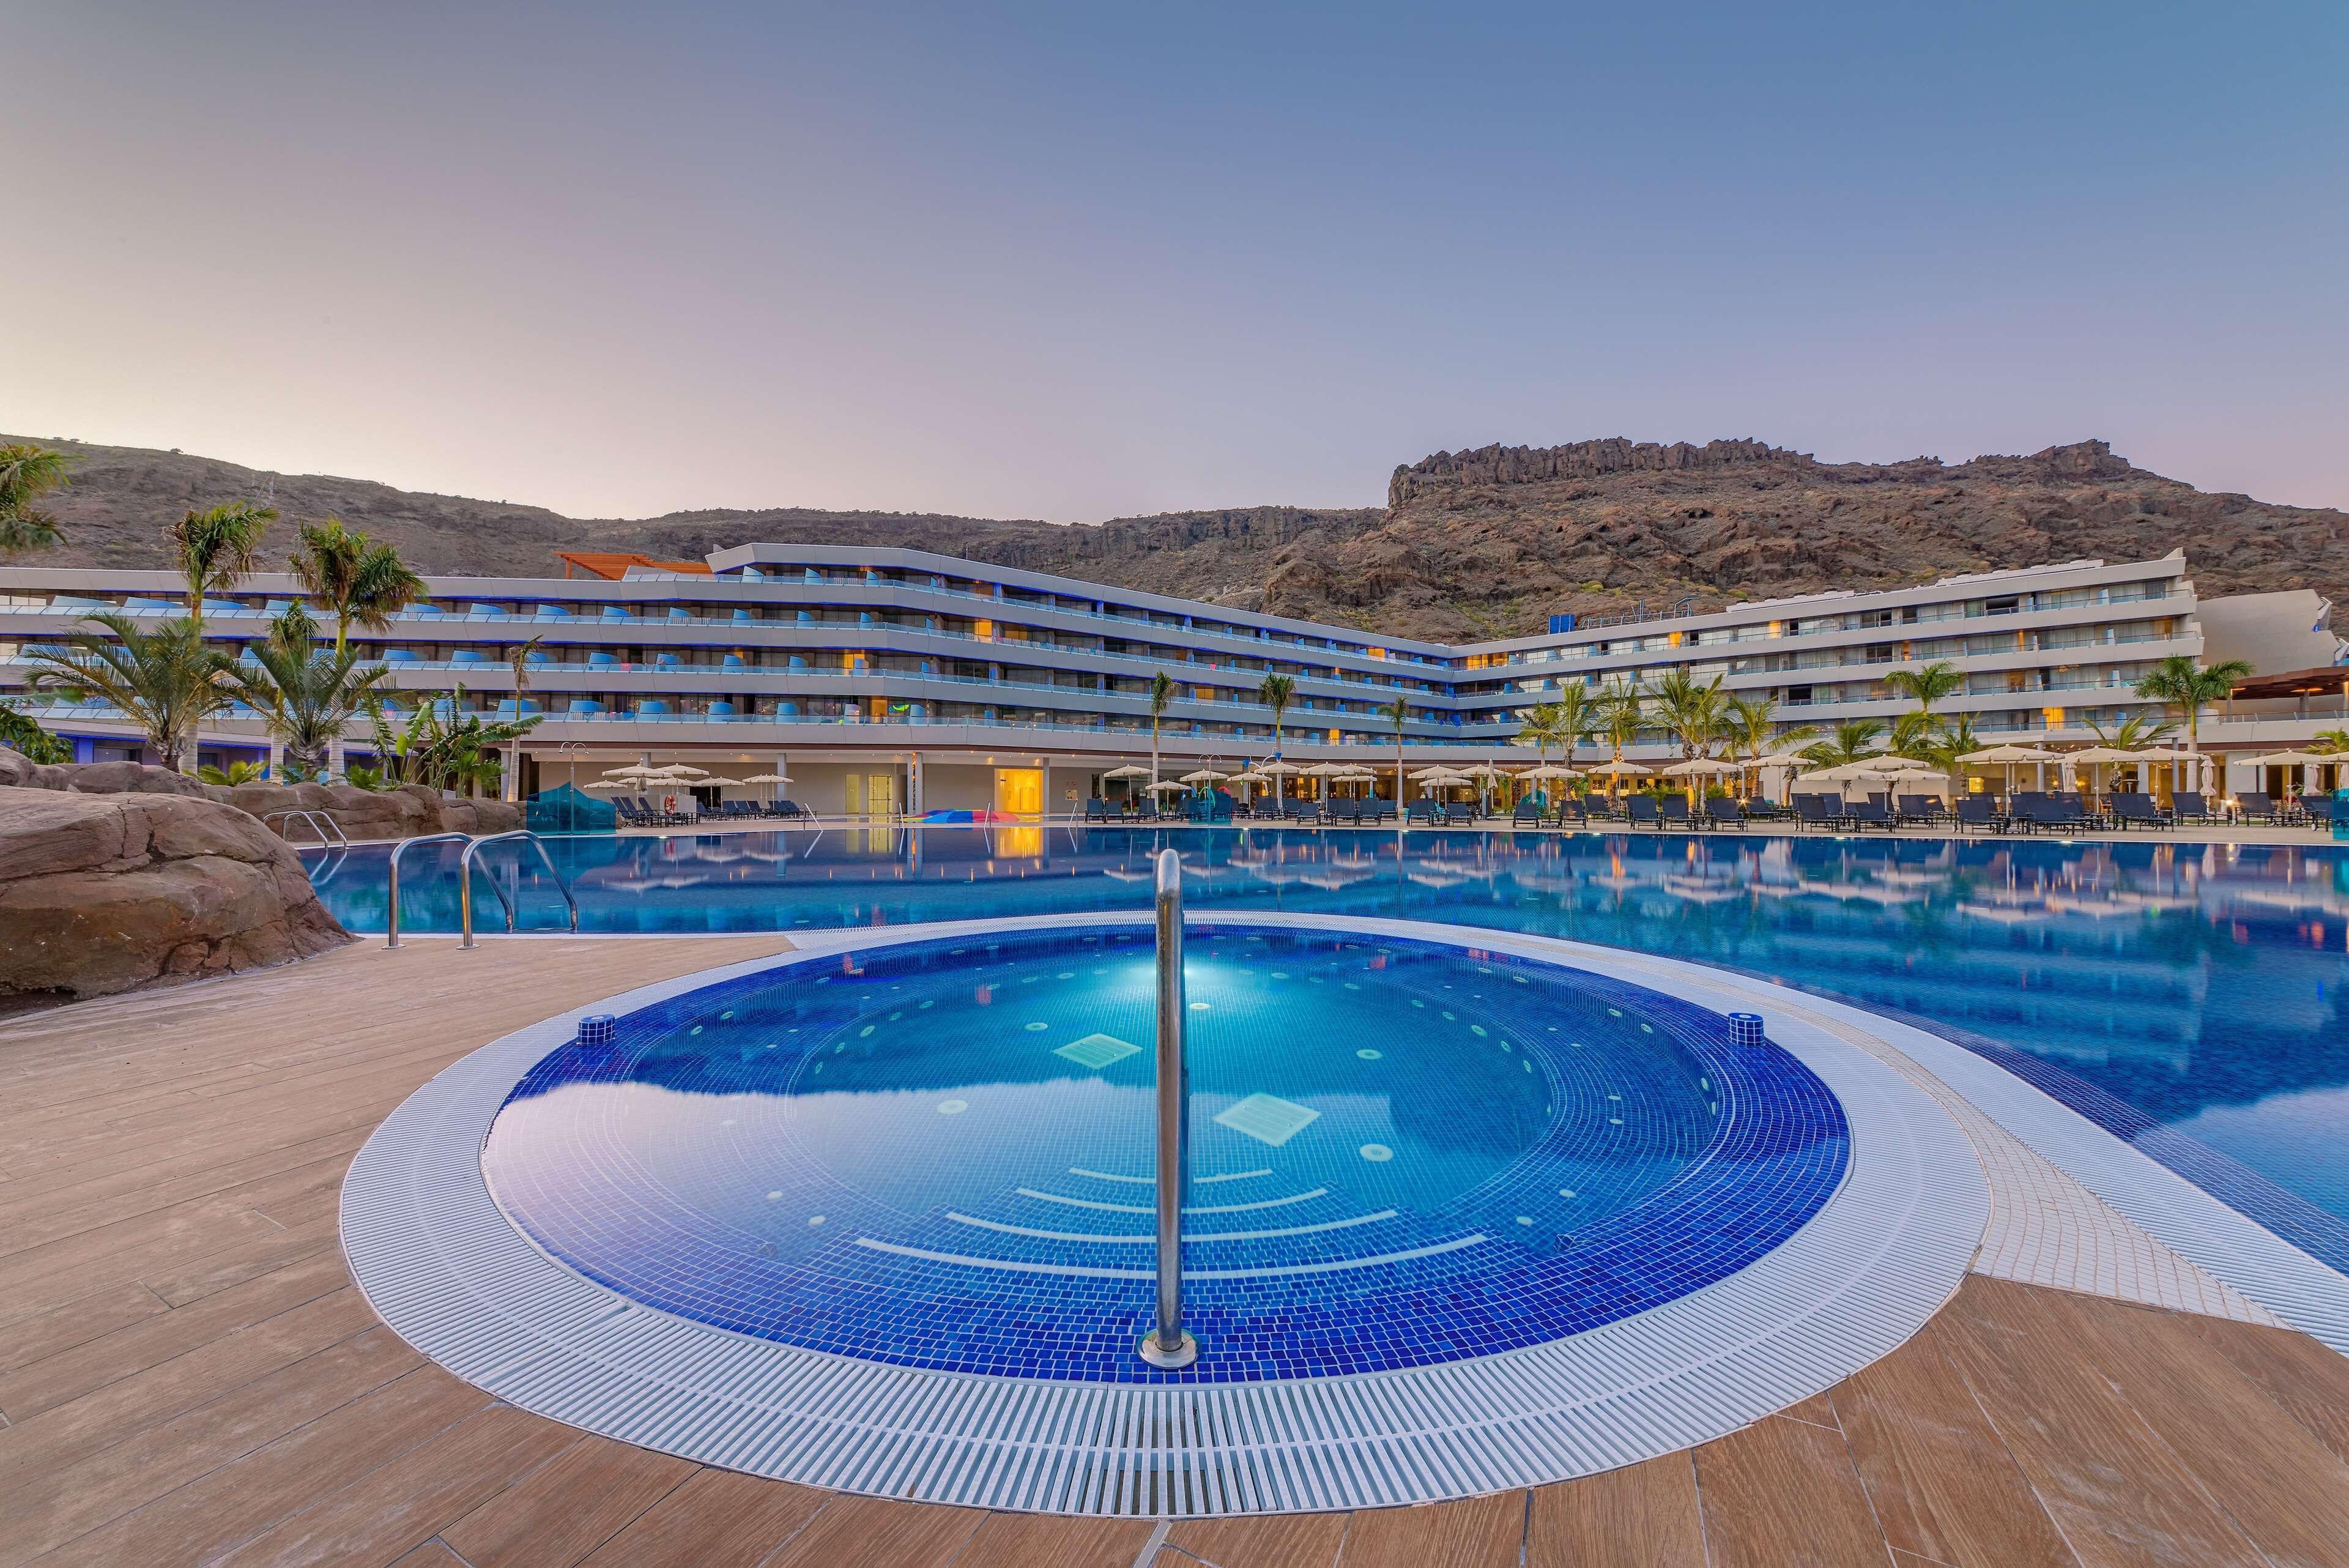 Courtesy of Radisson Blu Resort & Spa, Gran Canaria Mogan / Expedia.com